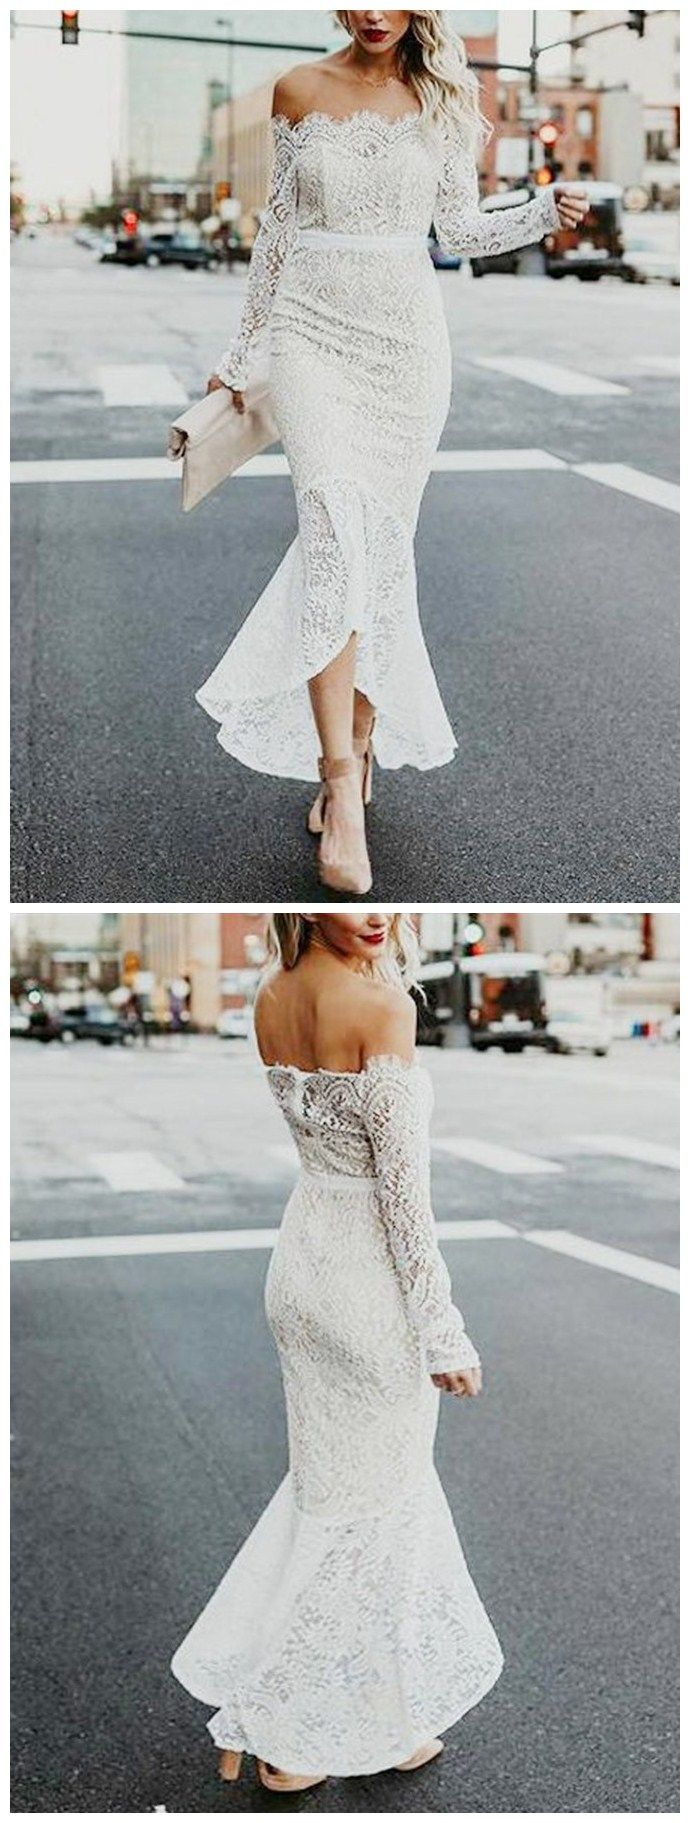 Long sleeve ivory wedding dress  Sexy Lace Offtheshoulder Neckline Hilo Mermaid Wedding Dresses